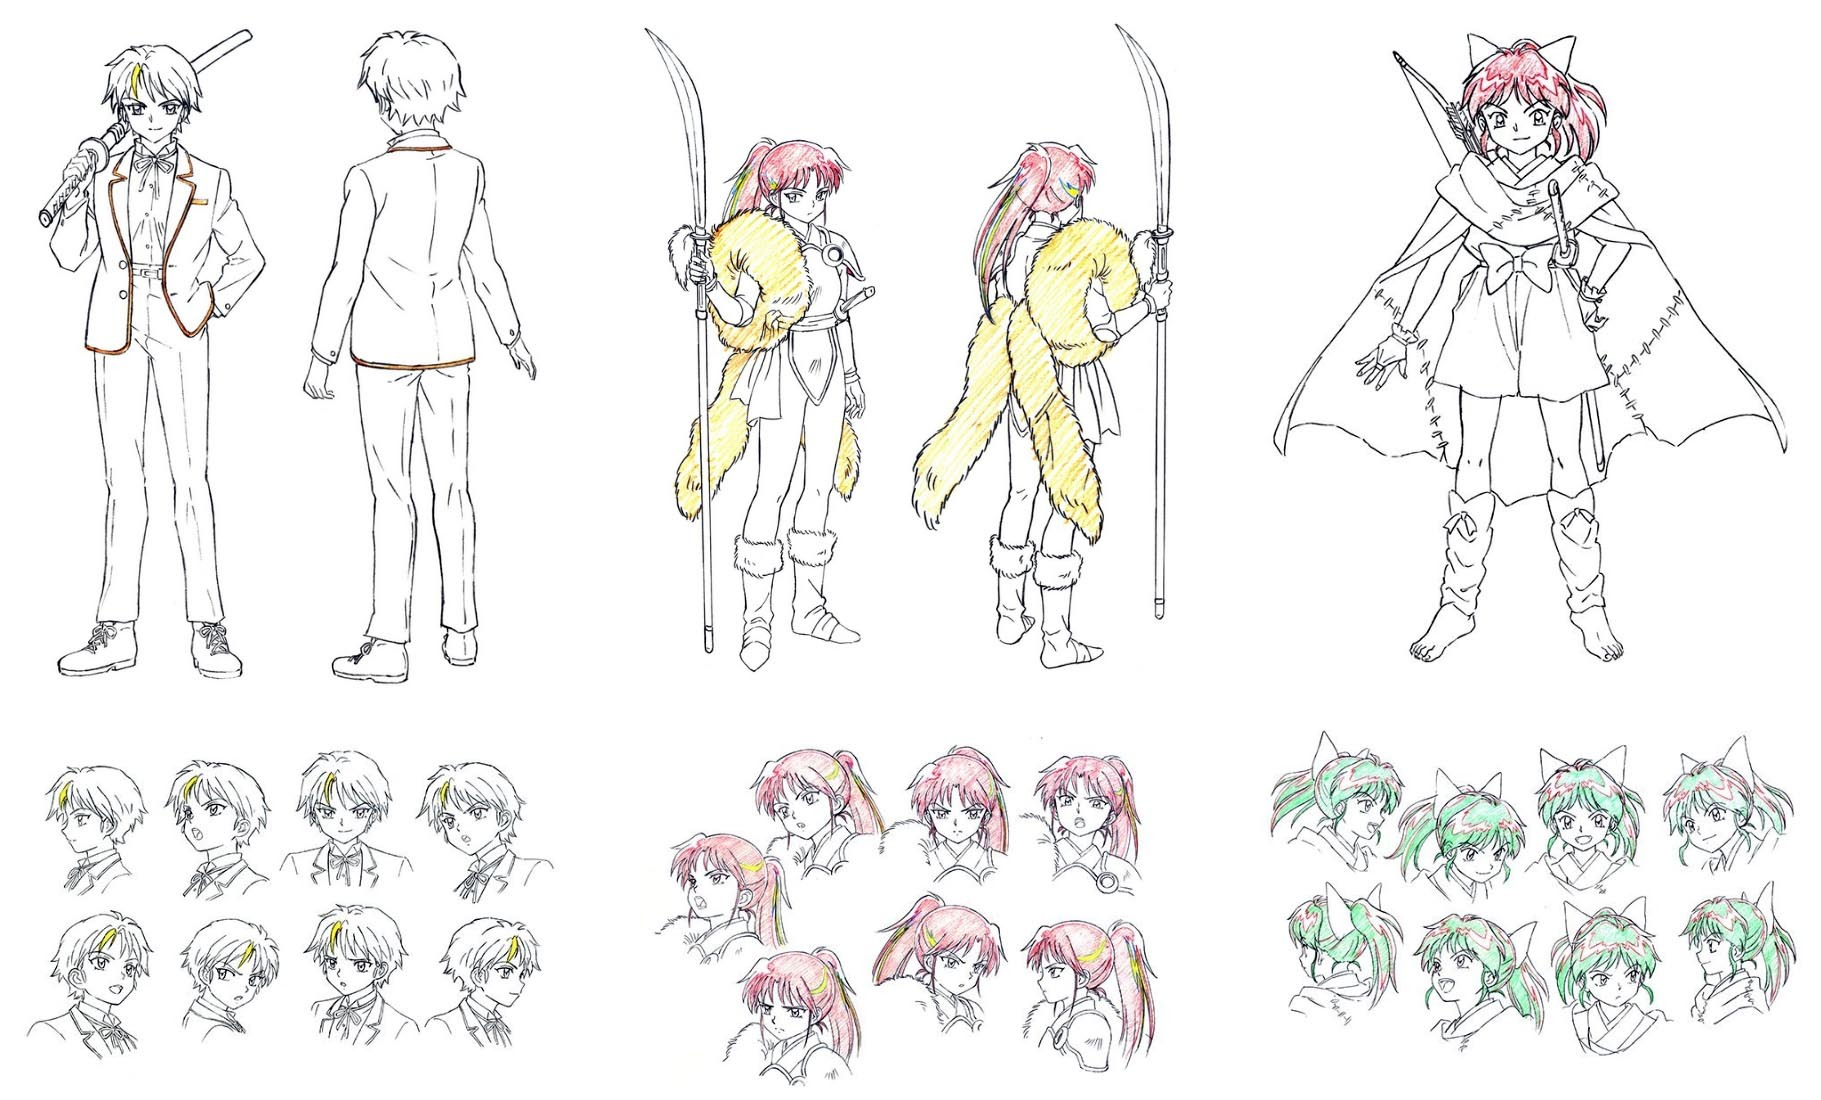 https://desu.shikimori.one/system/user_images/original/104487/1054848.jpg